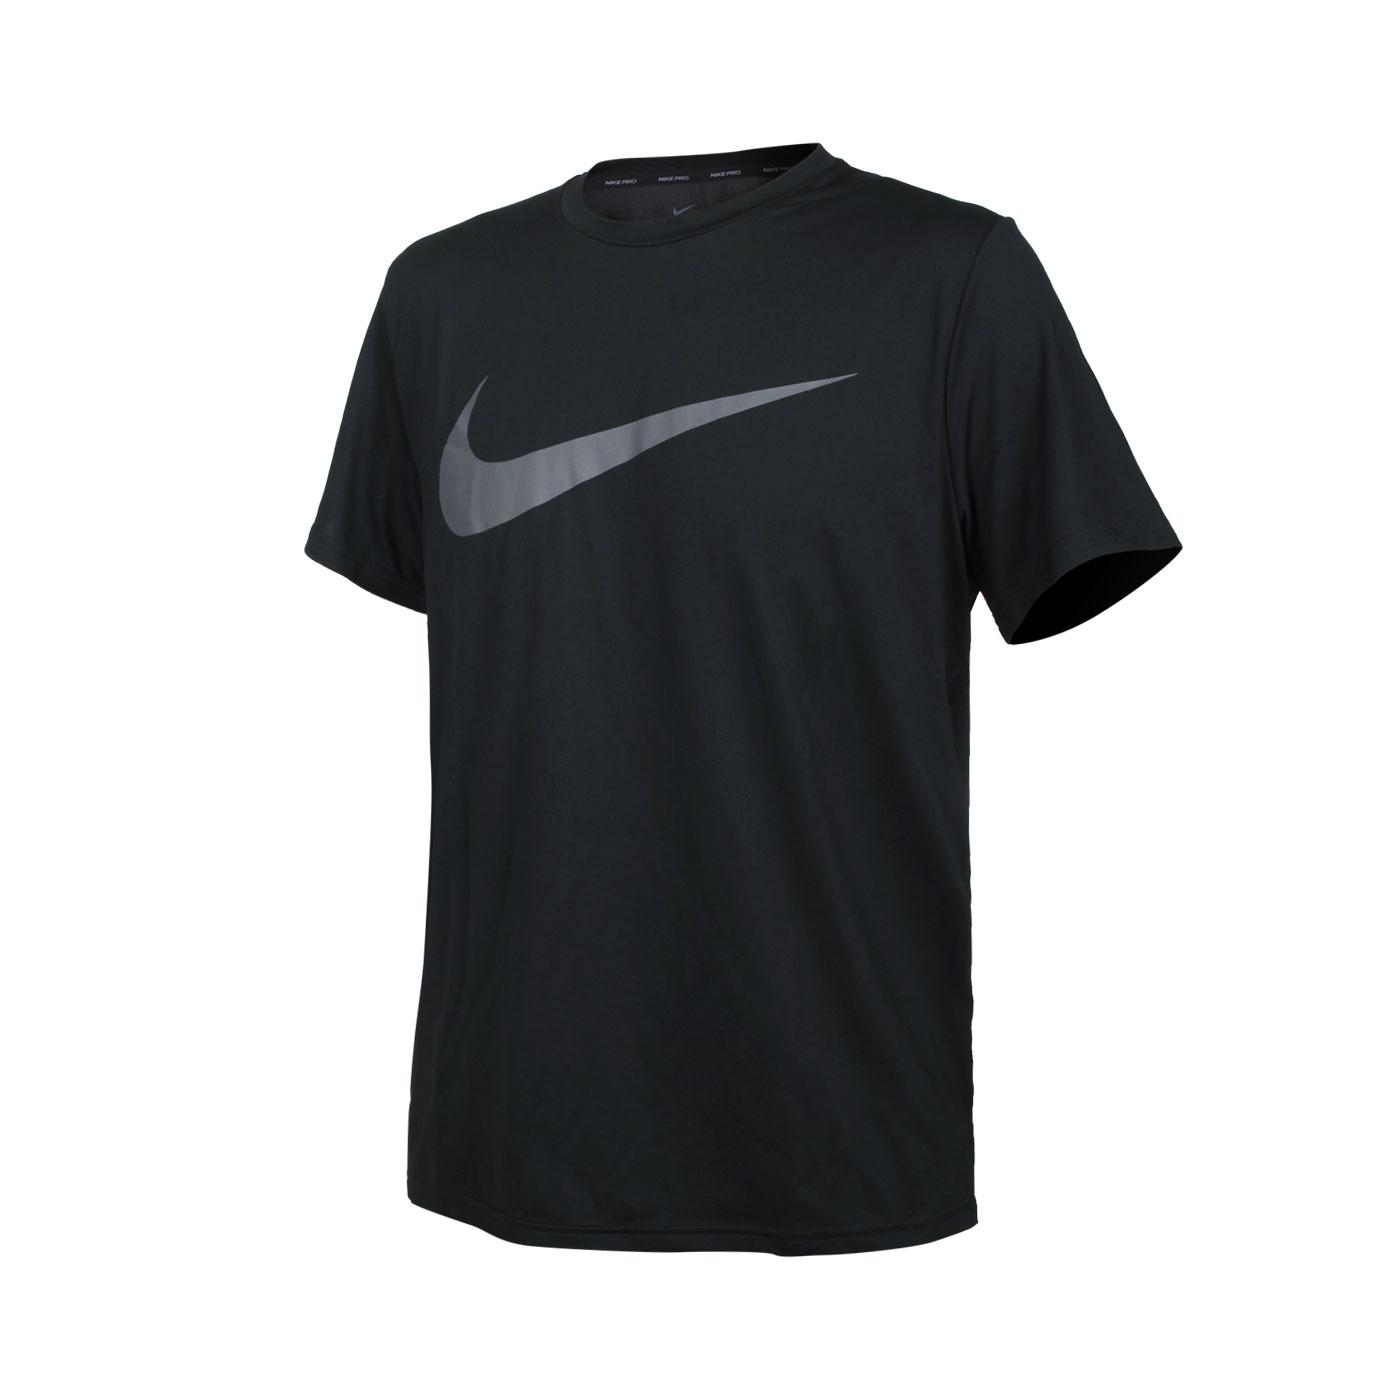 NIKE 男款短袖T恤 CZ2418-010 - 黑灰